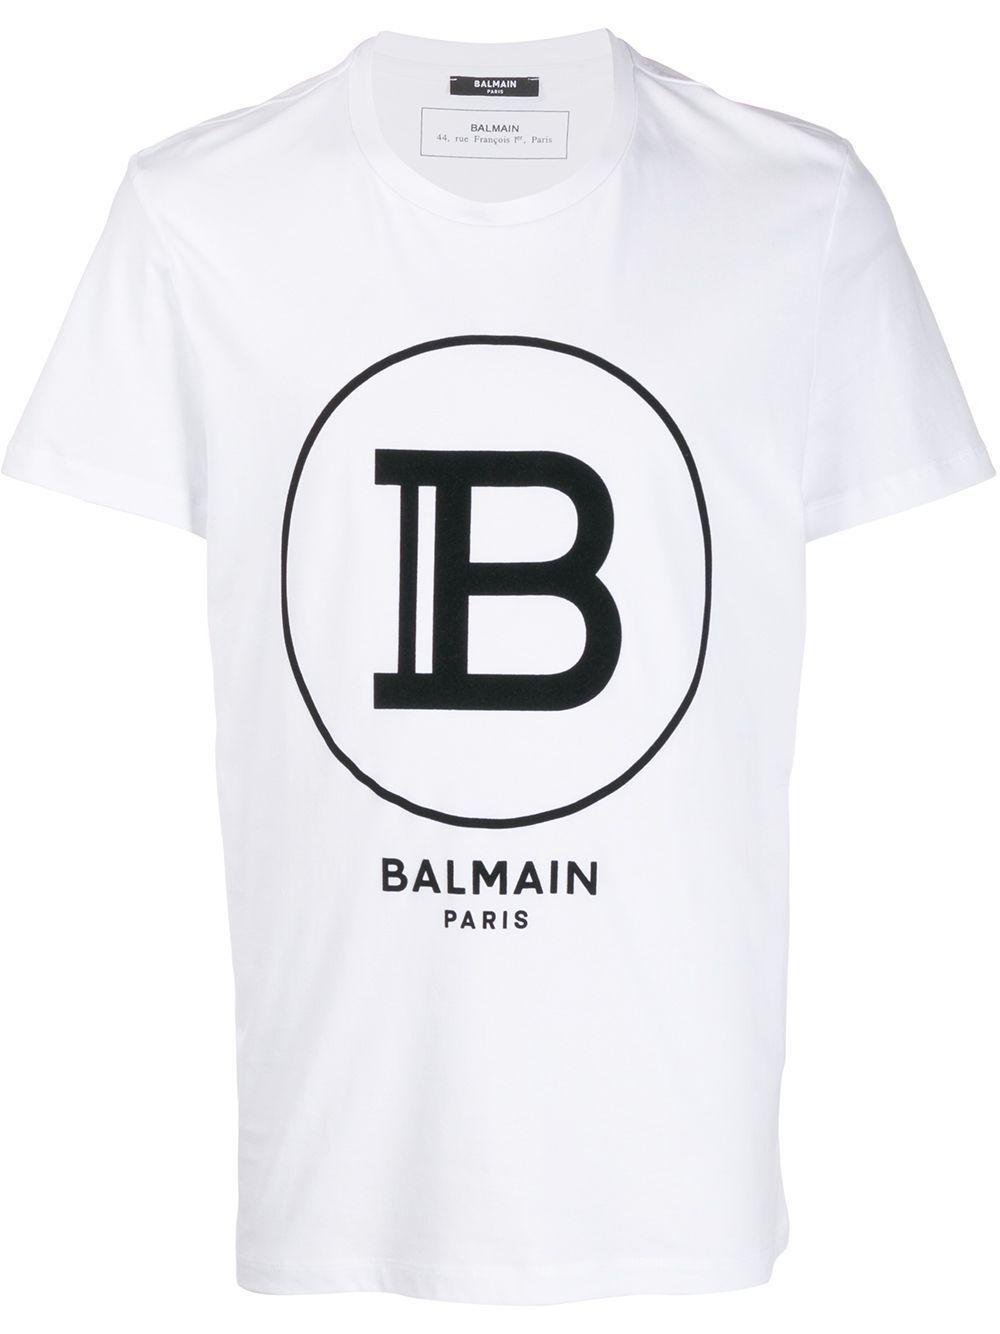 BALMAIN MEN'S TH11601I2010FA WHITE COTTON T-SHIRT